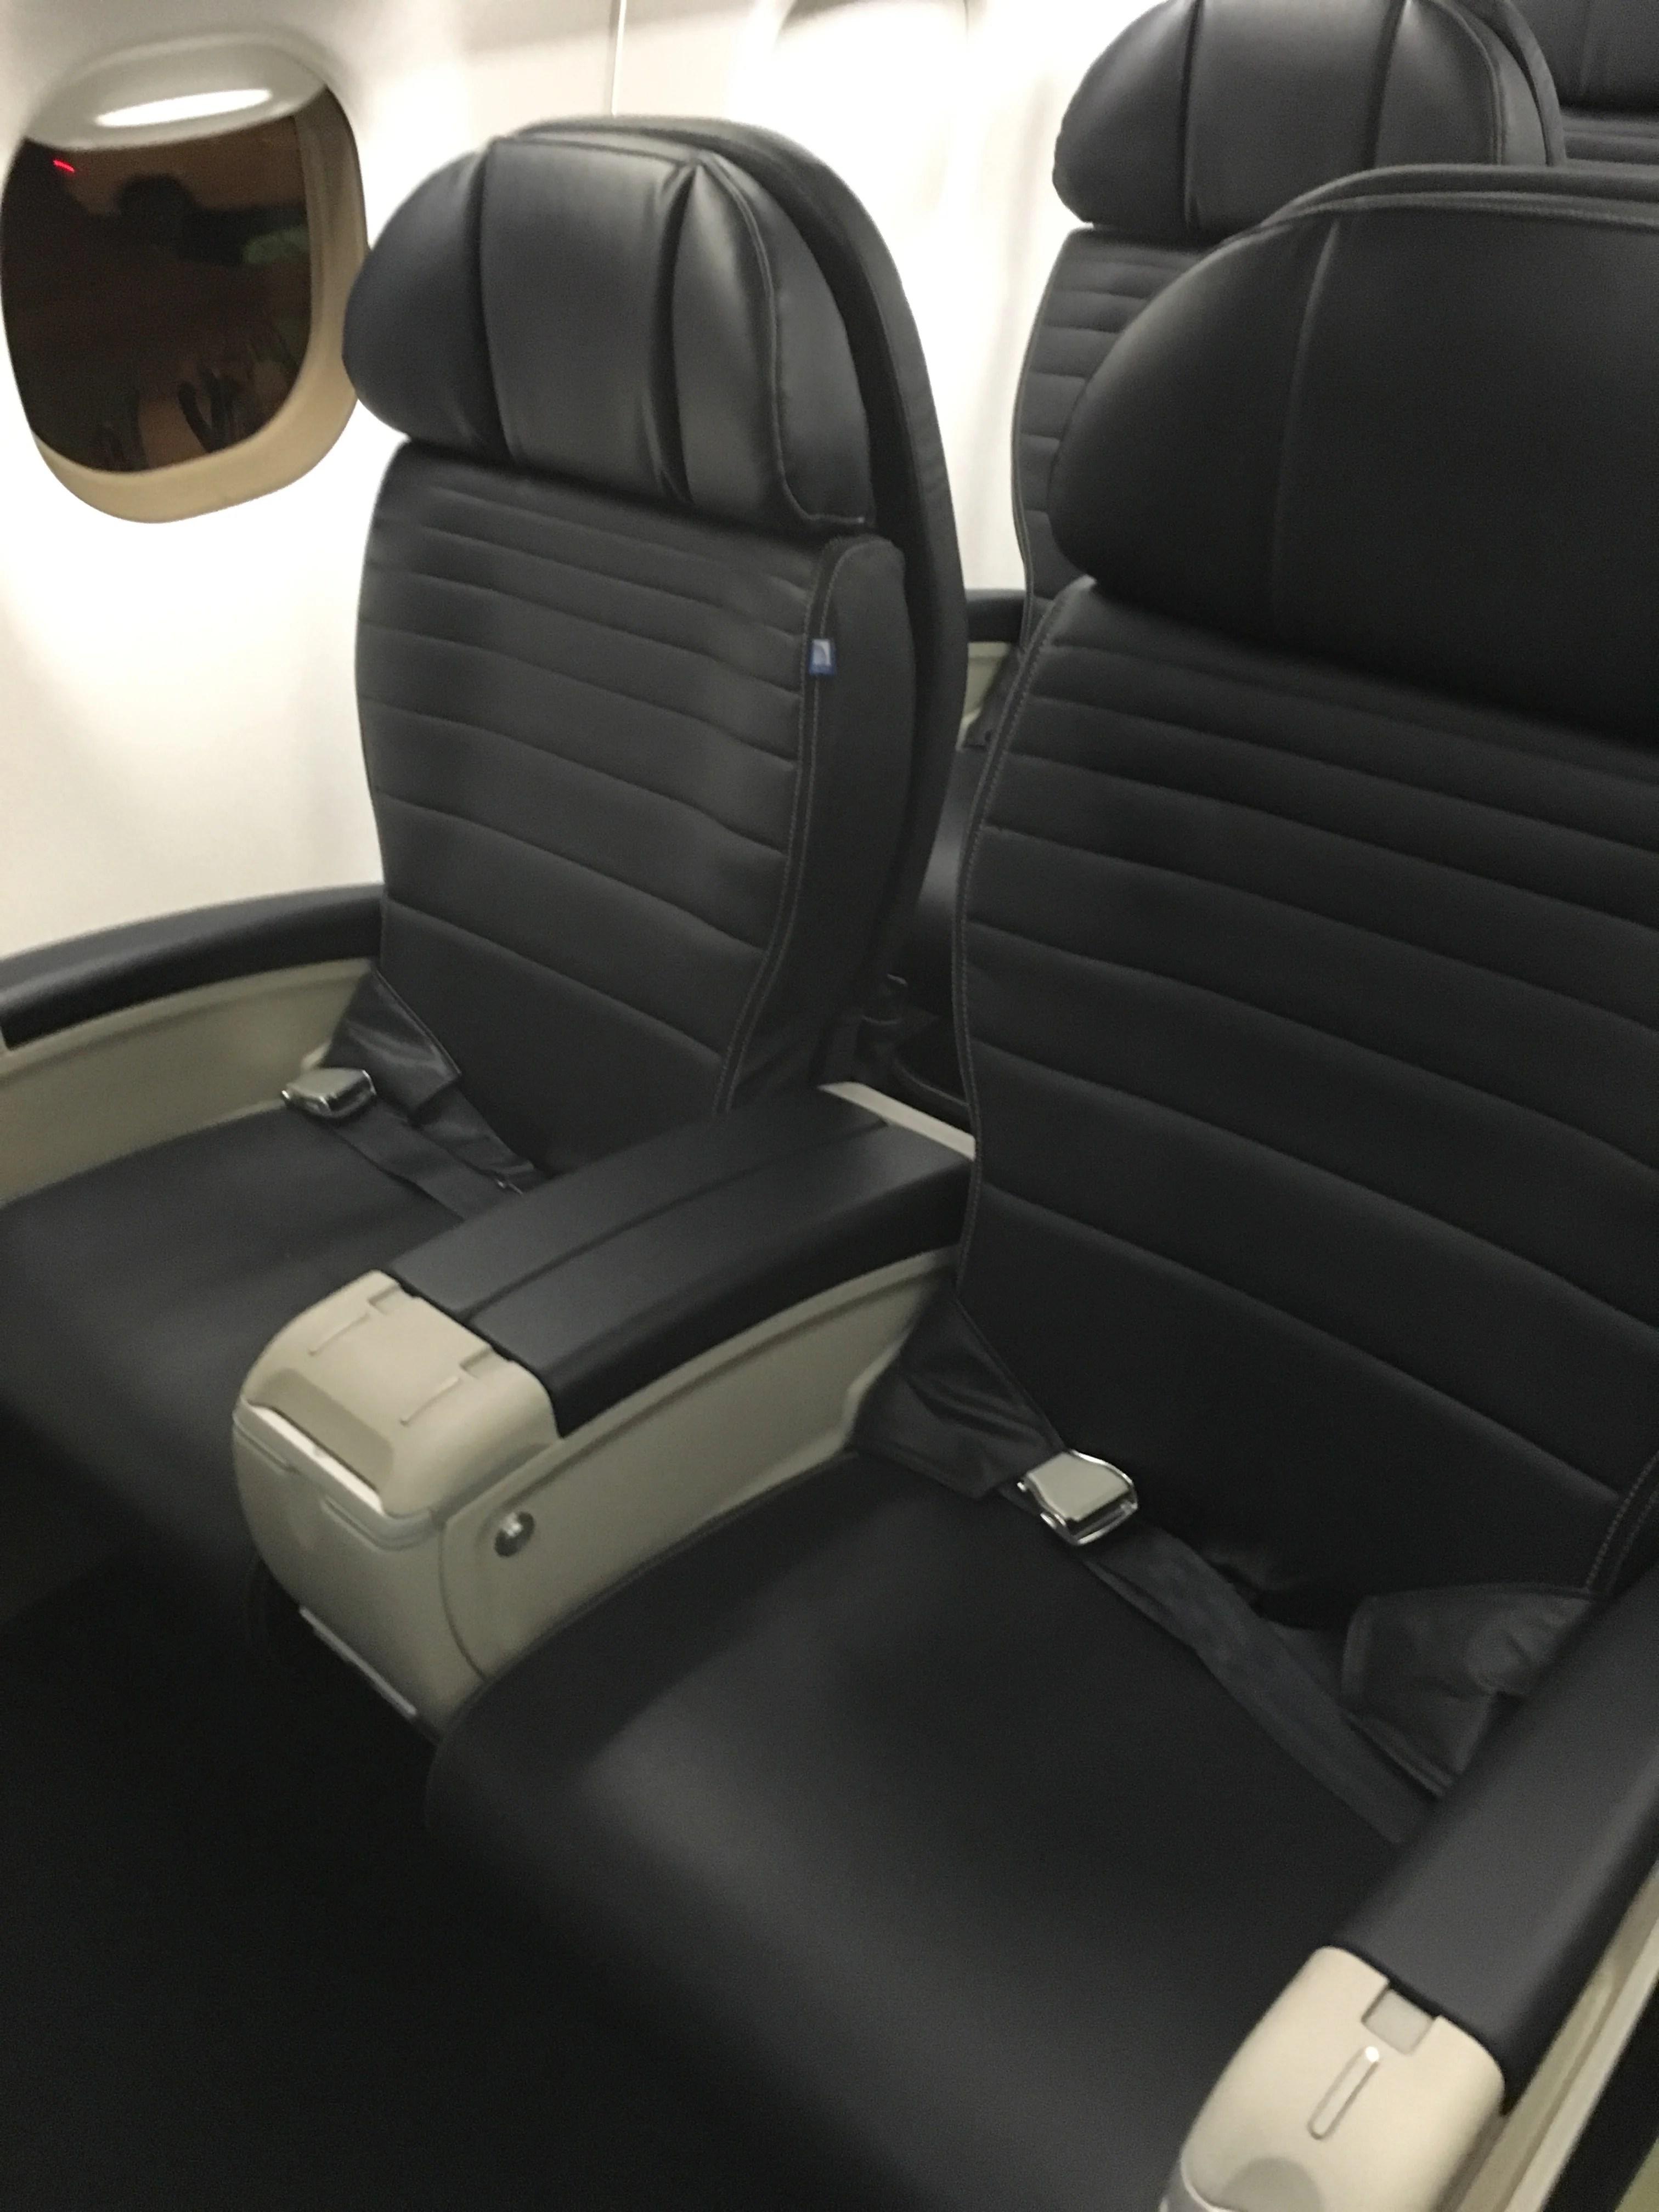 Embraer 175 Delta Under Seat Dimensions Brokeasshome Com